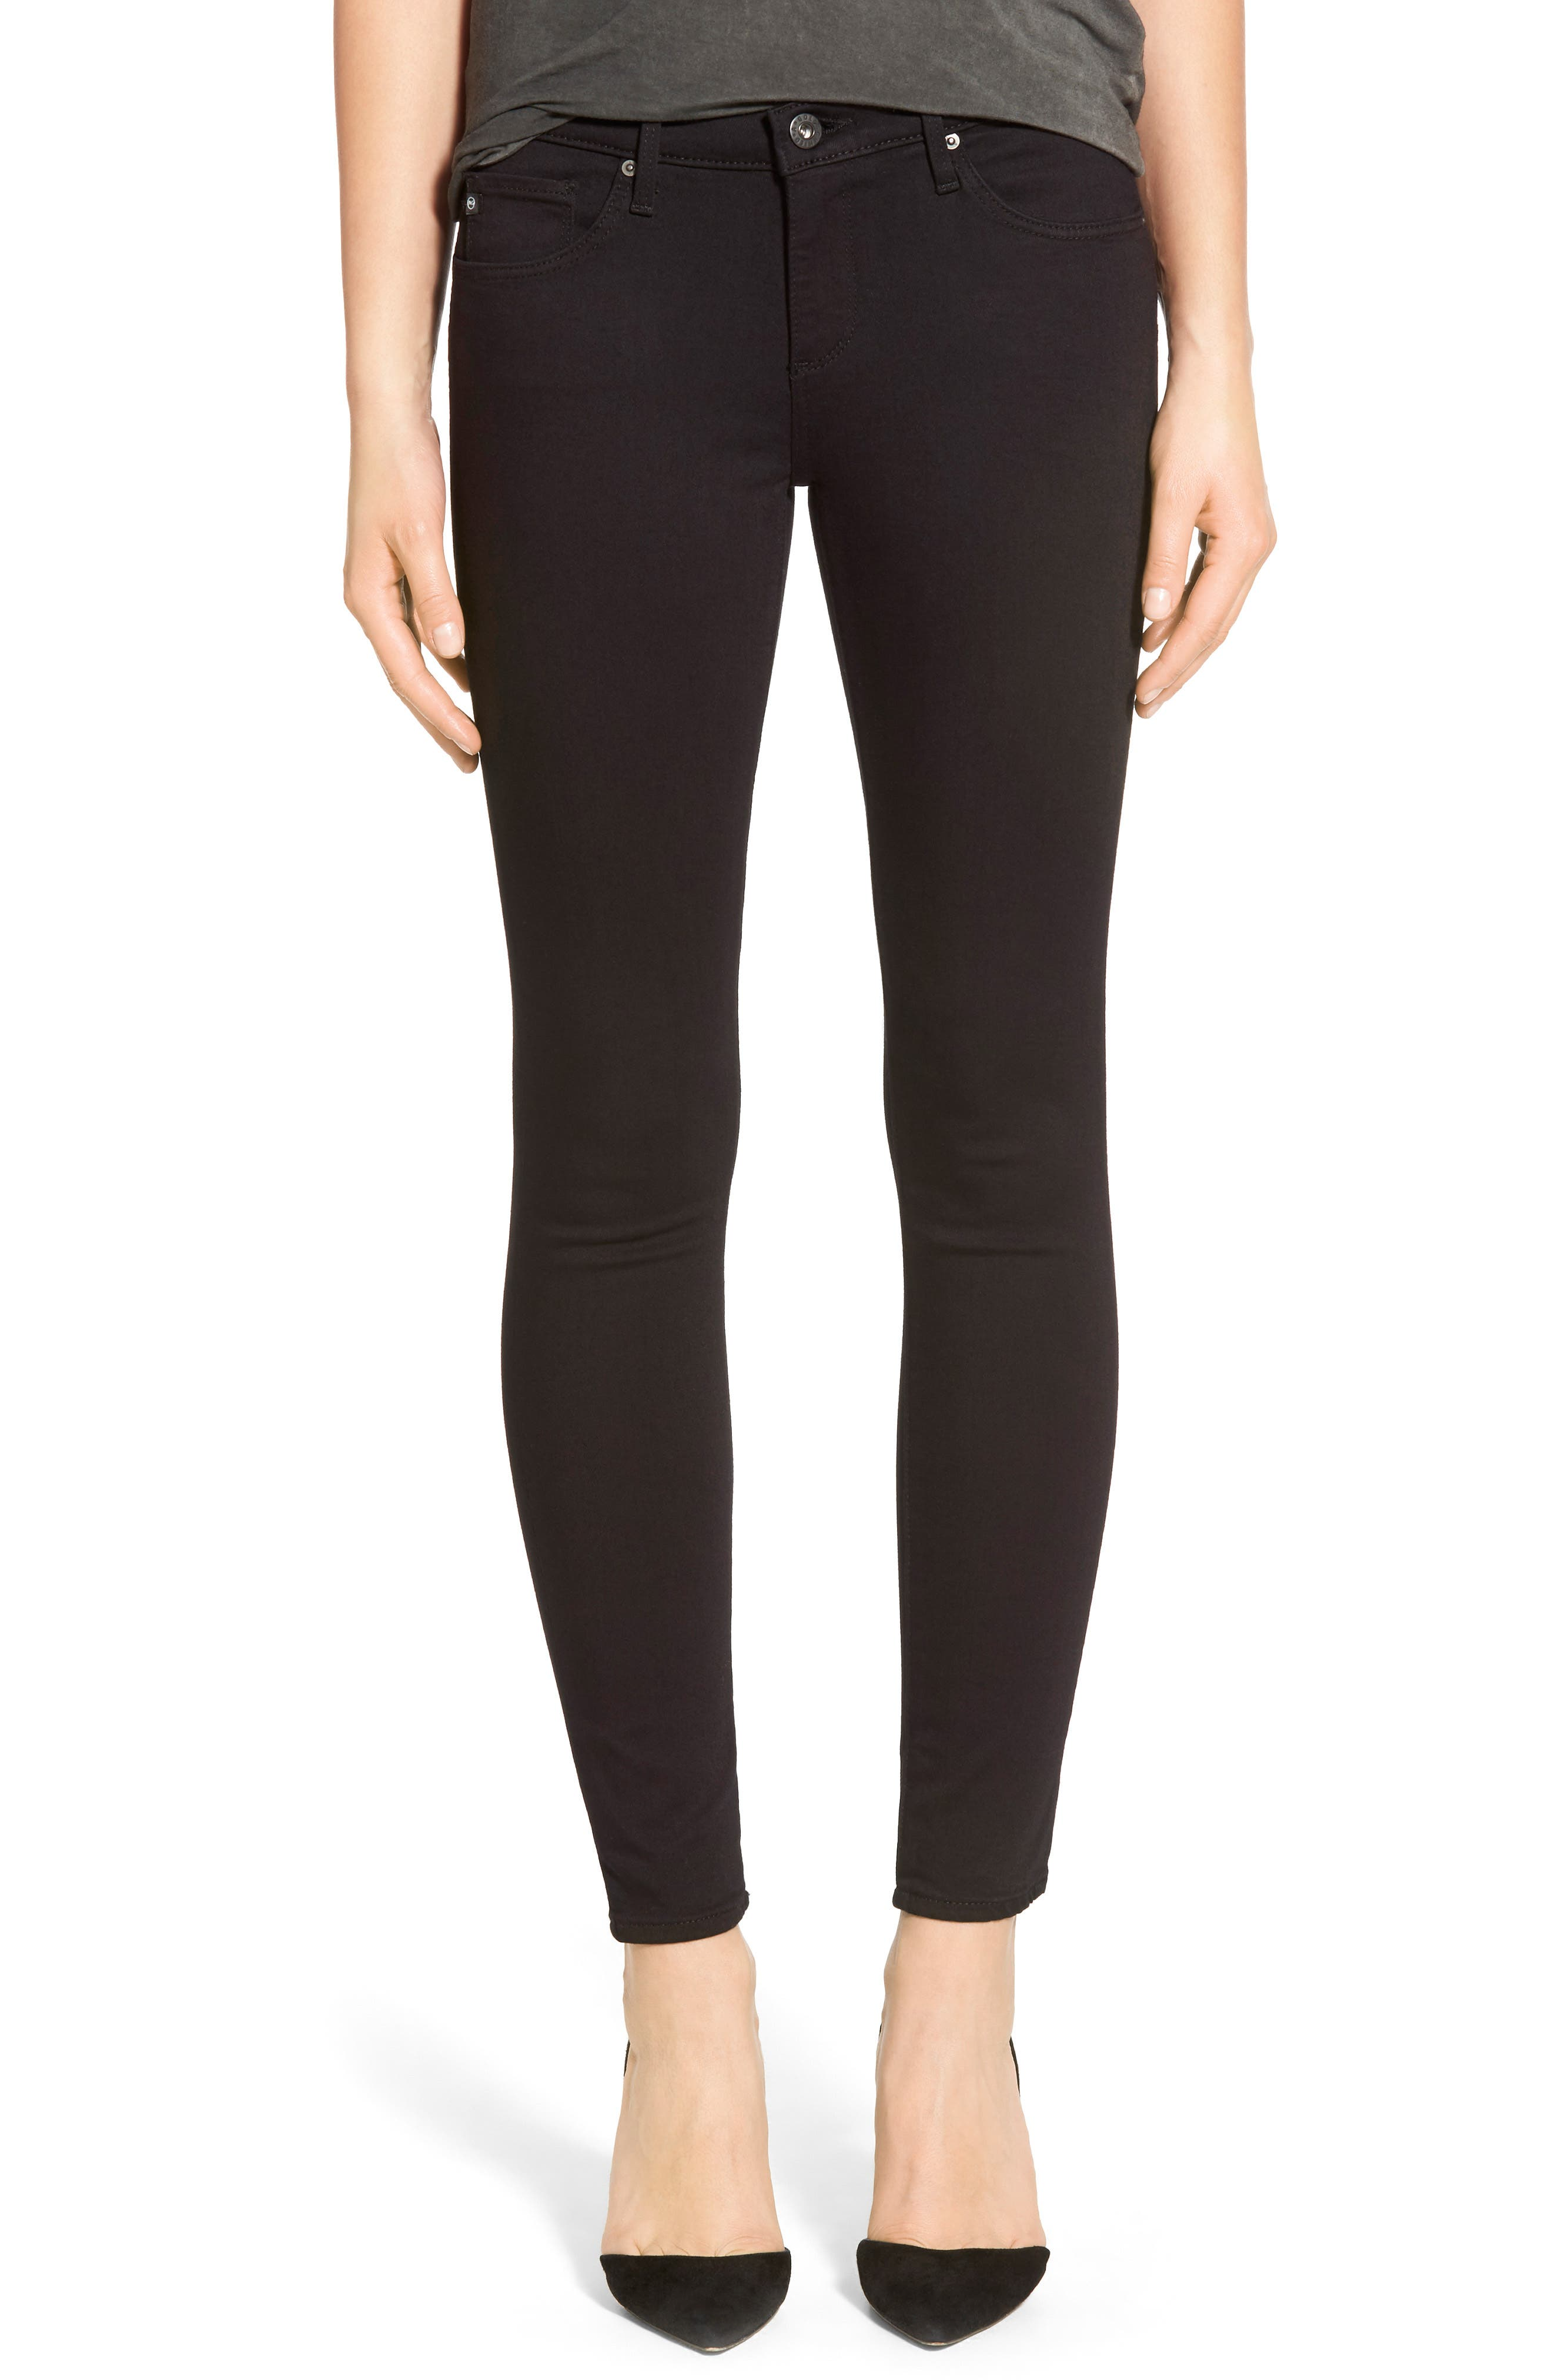 'The Legging' Ankle Super Skinny Jeans,                             Main thumbnail 1, color,                             SUPER BLACK